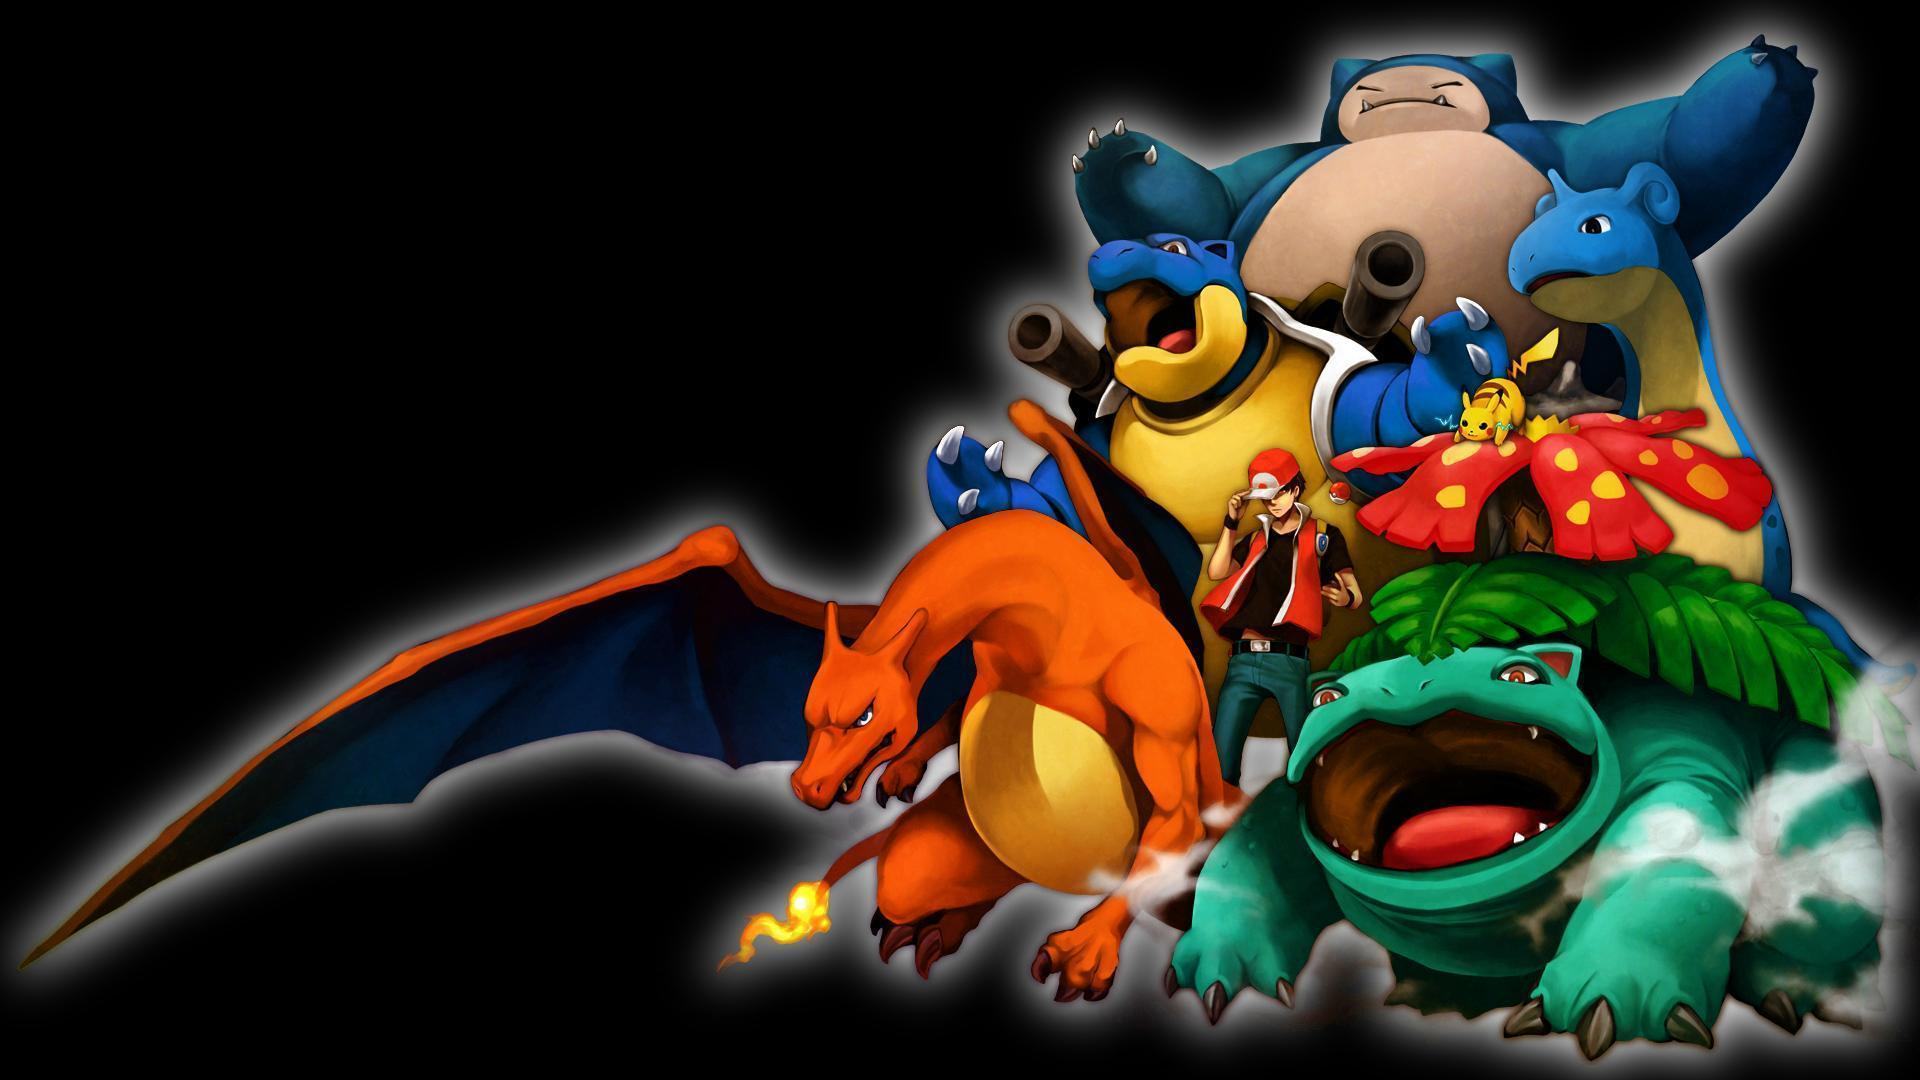 Pokemon Wallpapers 1920x1080 1920x1080